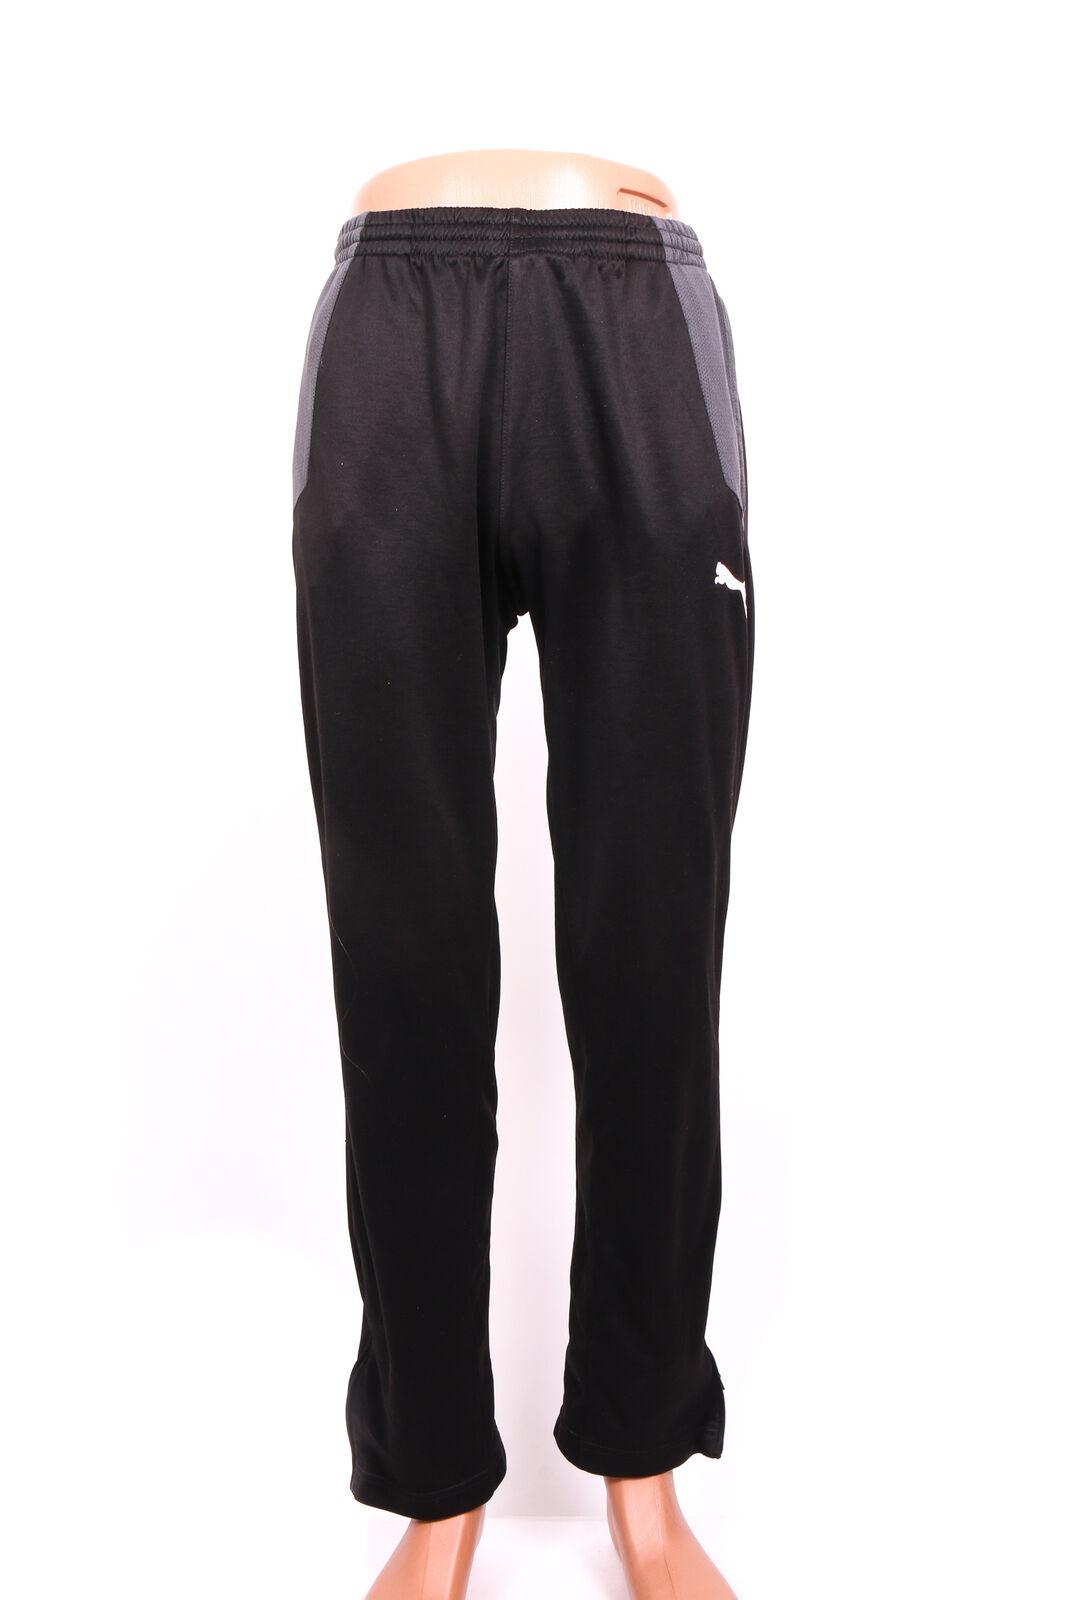 Puma Joggers Mens Sweatpants Running size M